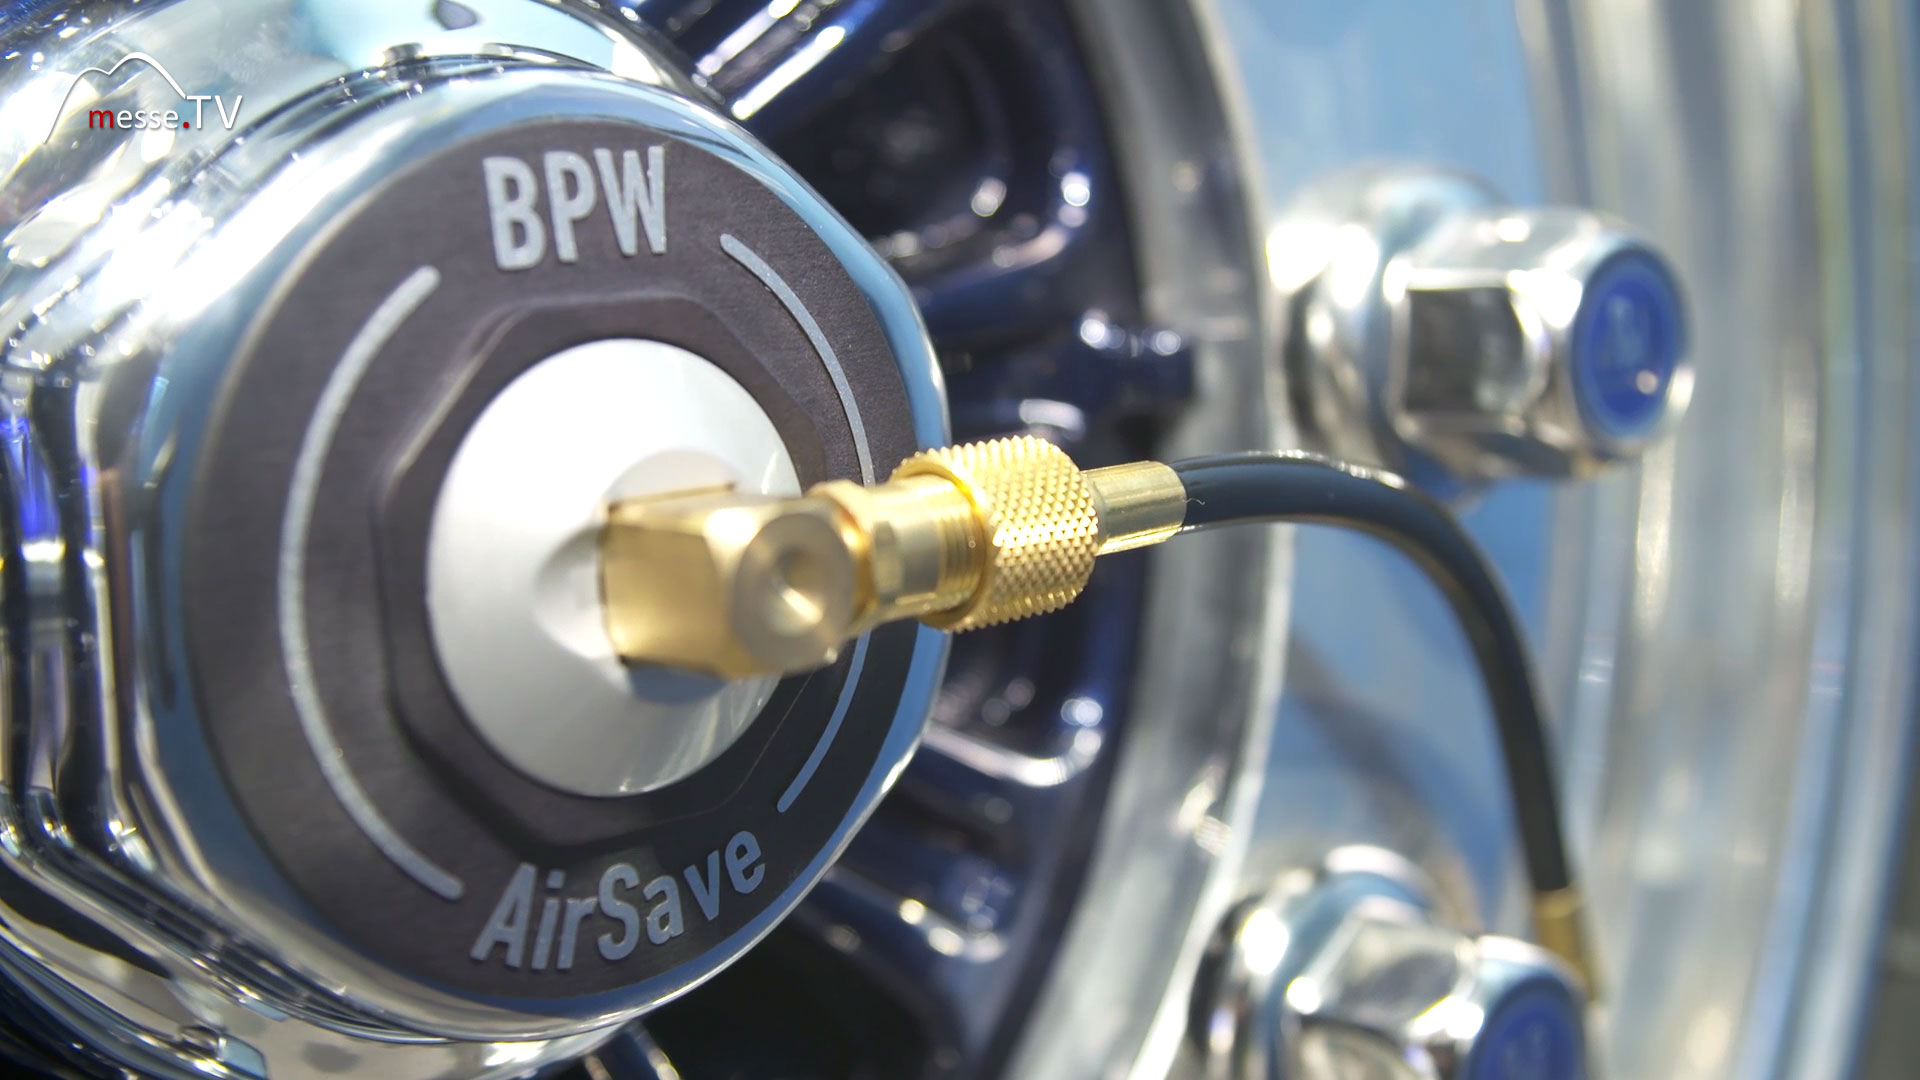 BPW AirSafe - LKW Reifendruck Regelsystem